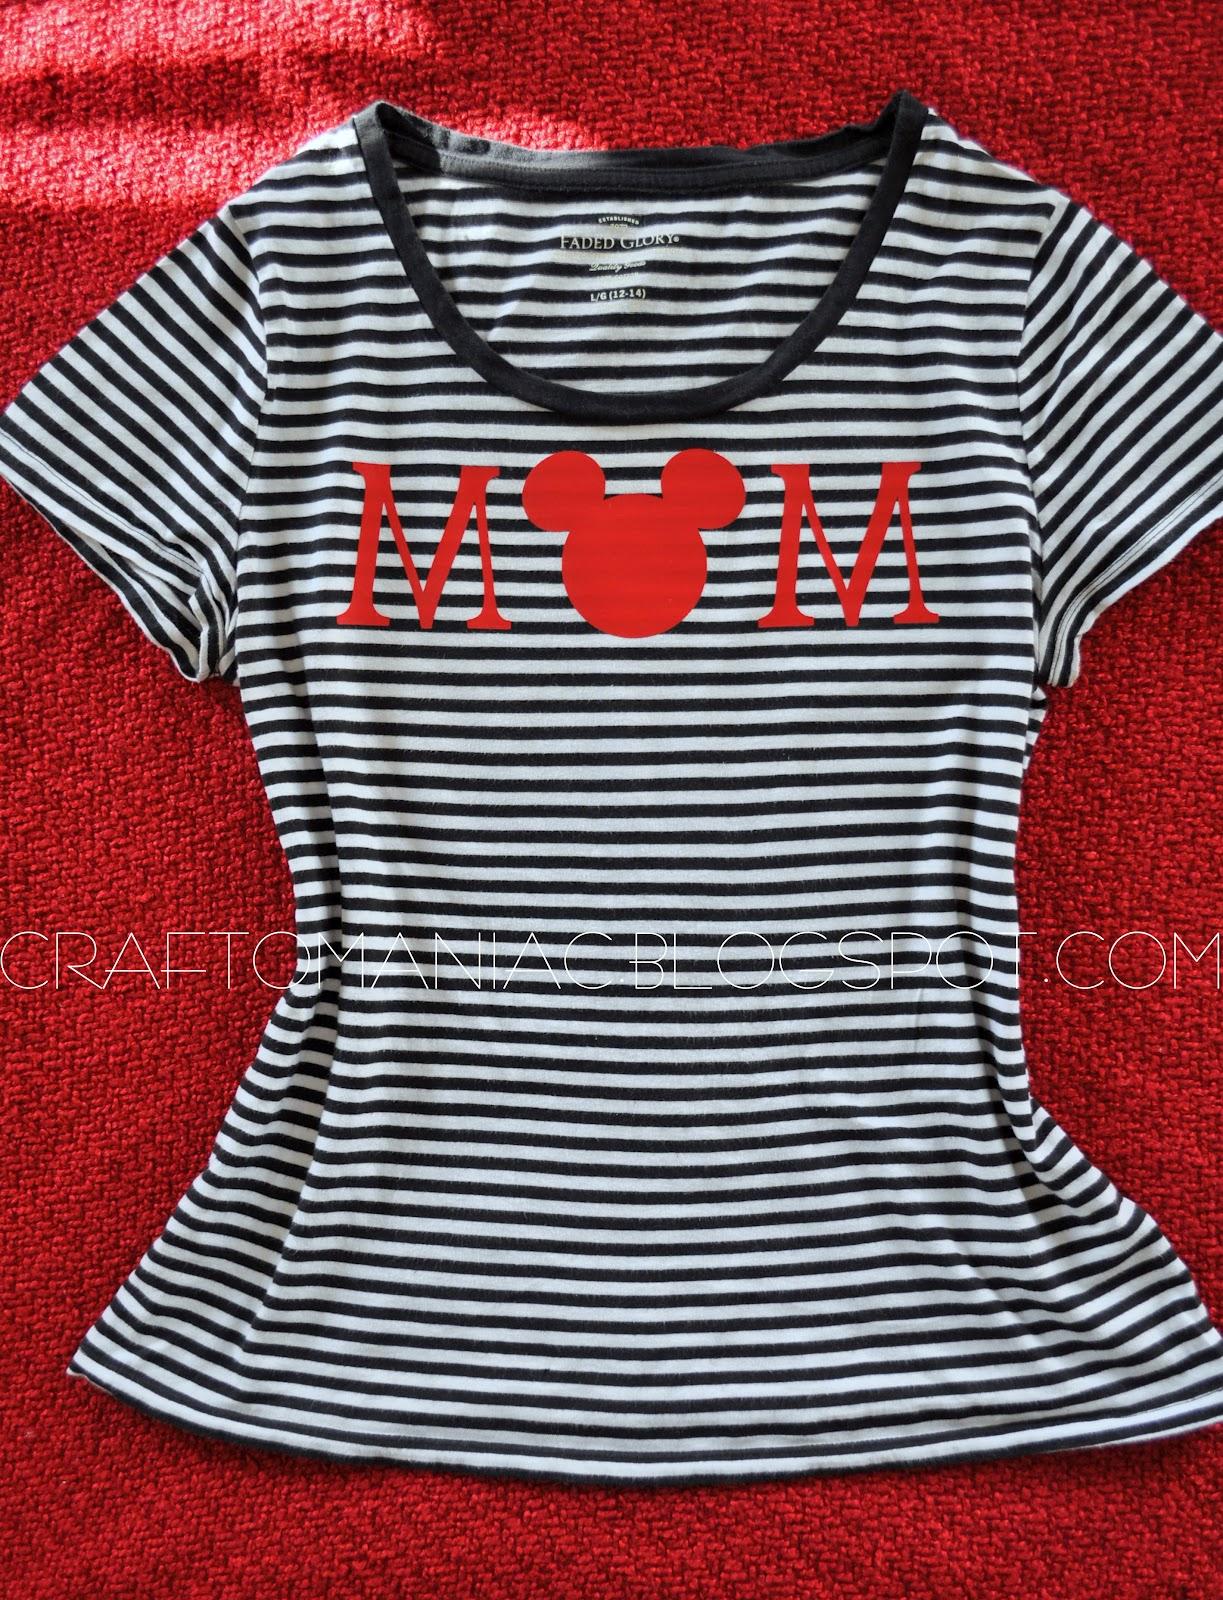 DIY Disneyland Shirt - and other cute clothing ideas ...